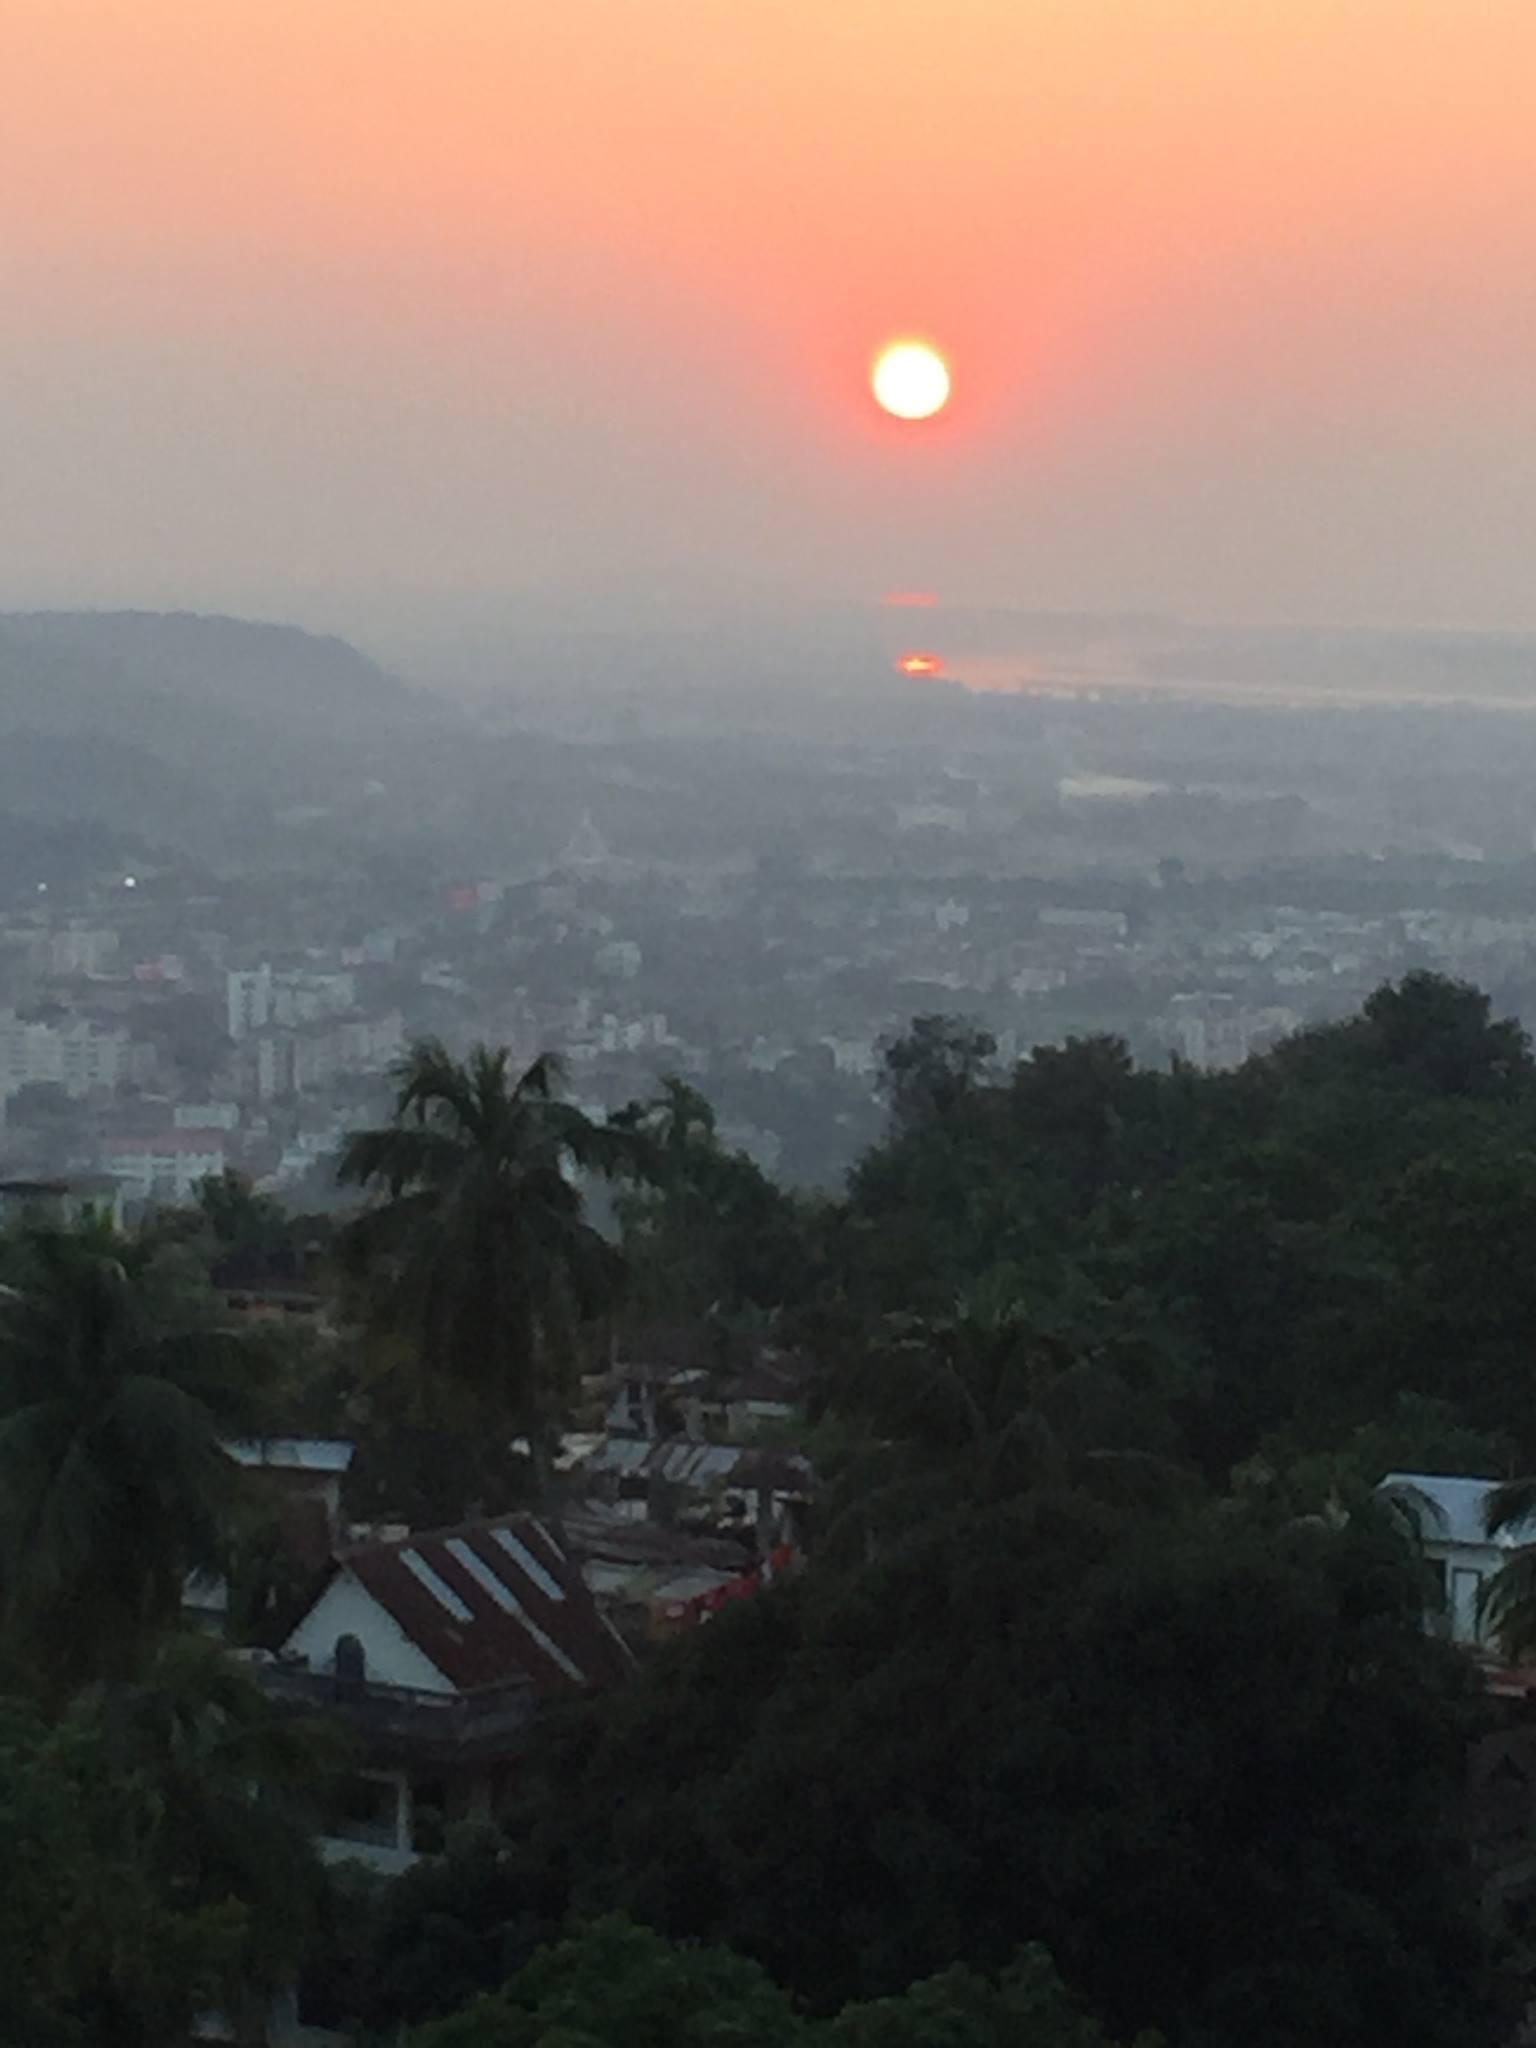 Sunset over the Brahmaputra, Kamakhya